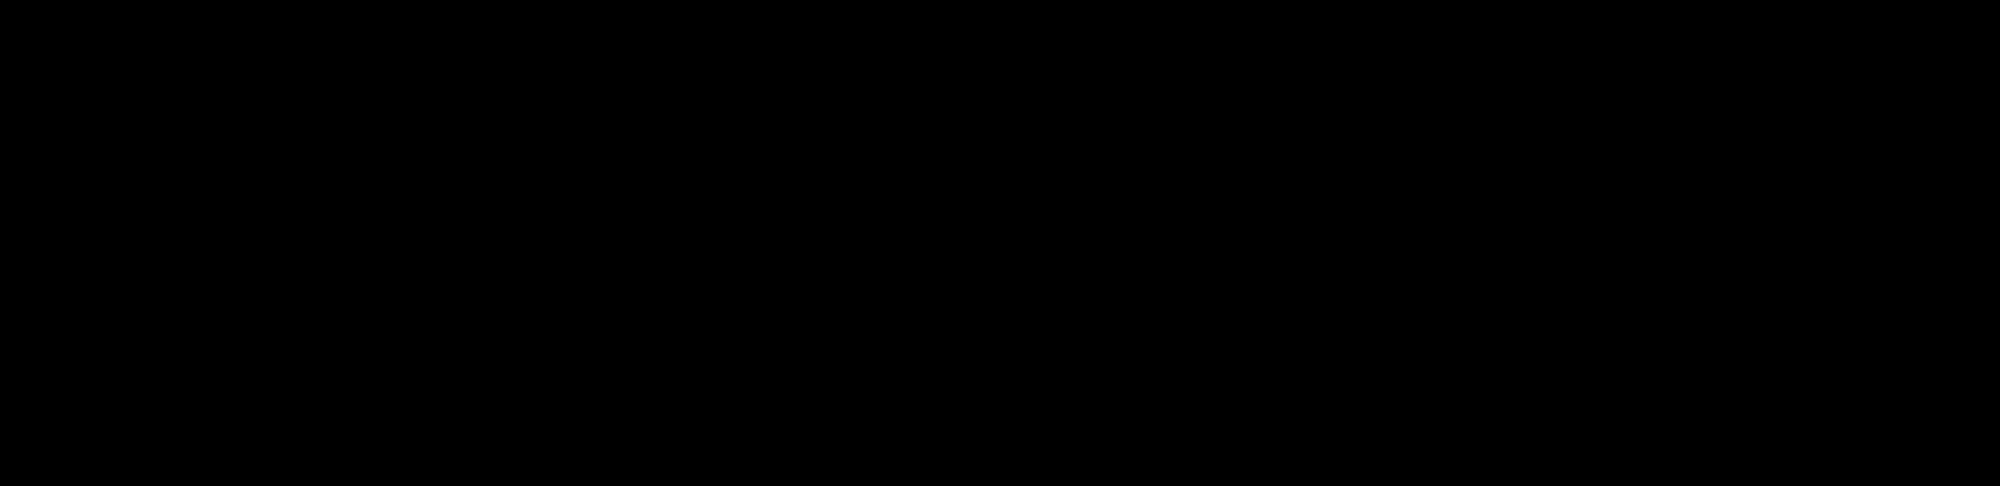 App Academy full logo